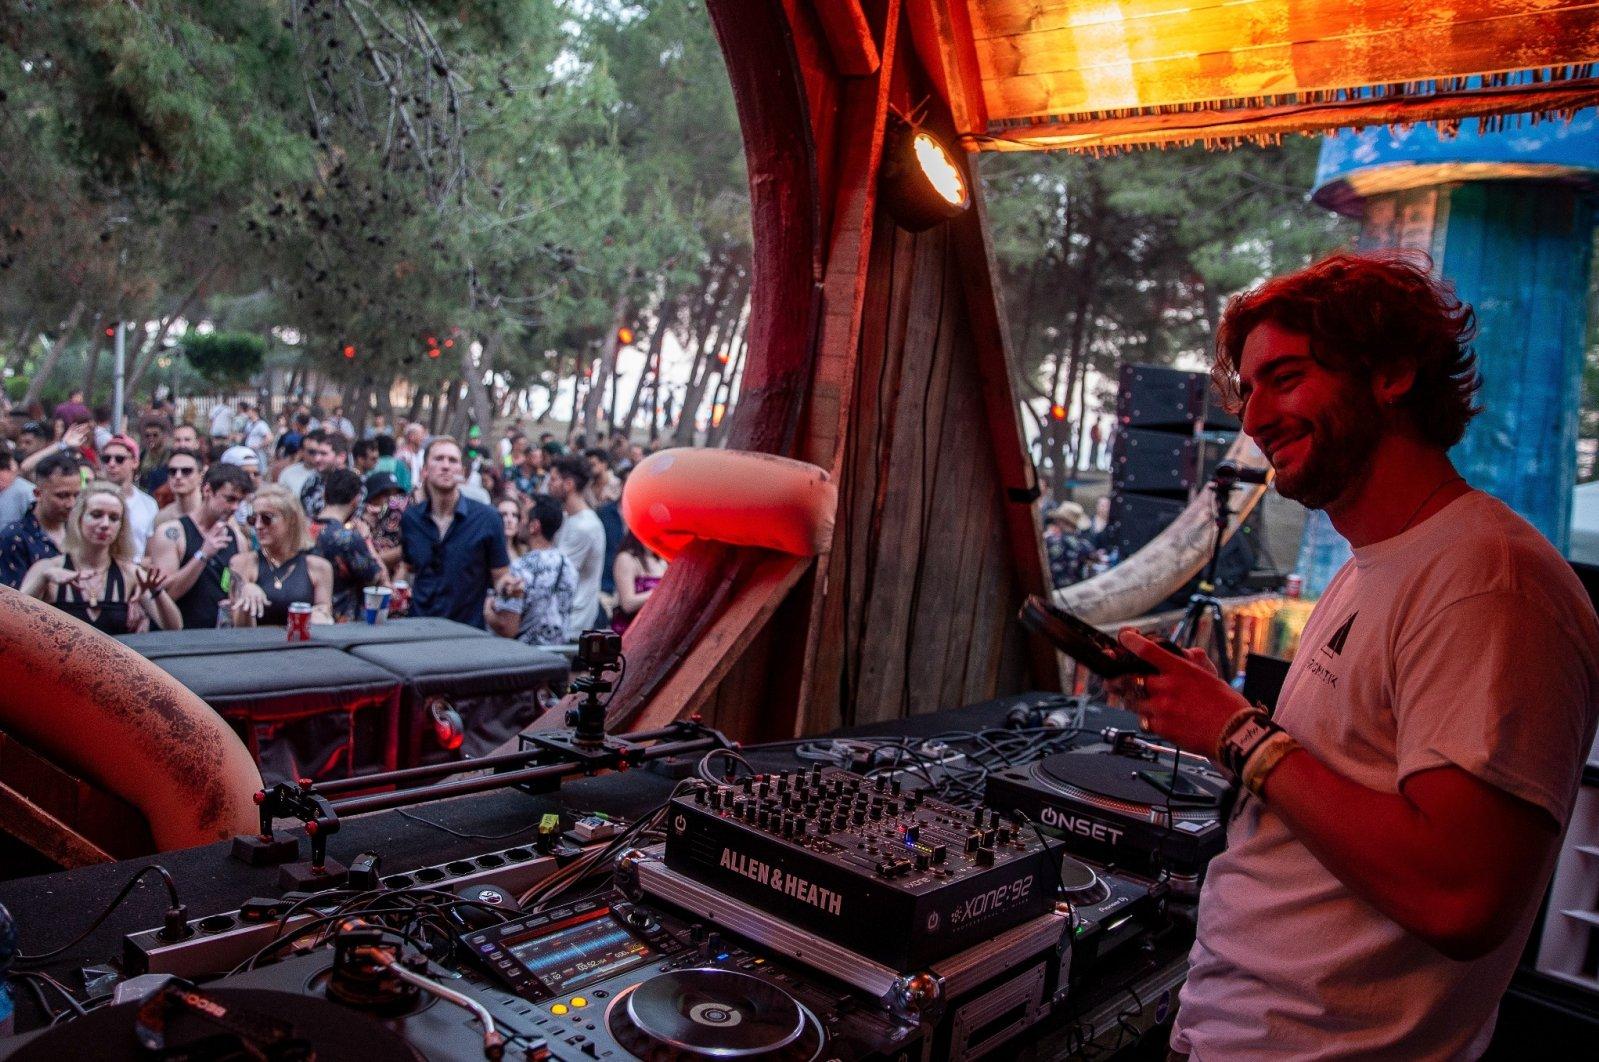 Rron Kurtolli Chicago,Ilinois based DJ performs in front of thousands of international fans at Unum Albania's open-air music festival in Shengjin, Albania, June 4, 2021. (AP Photo)